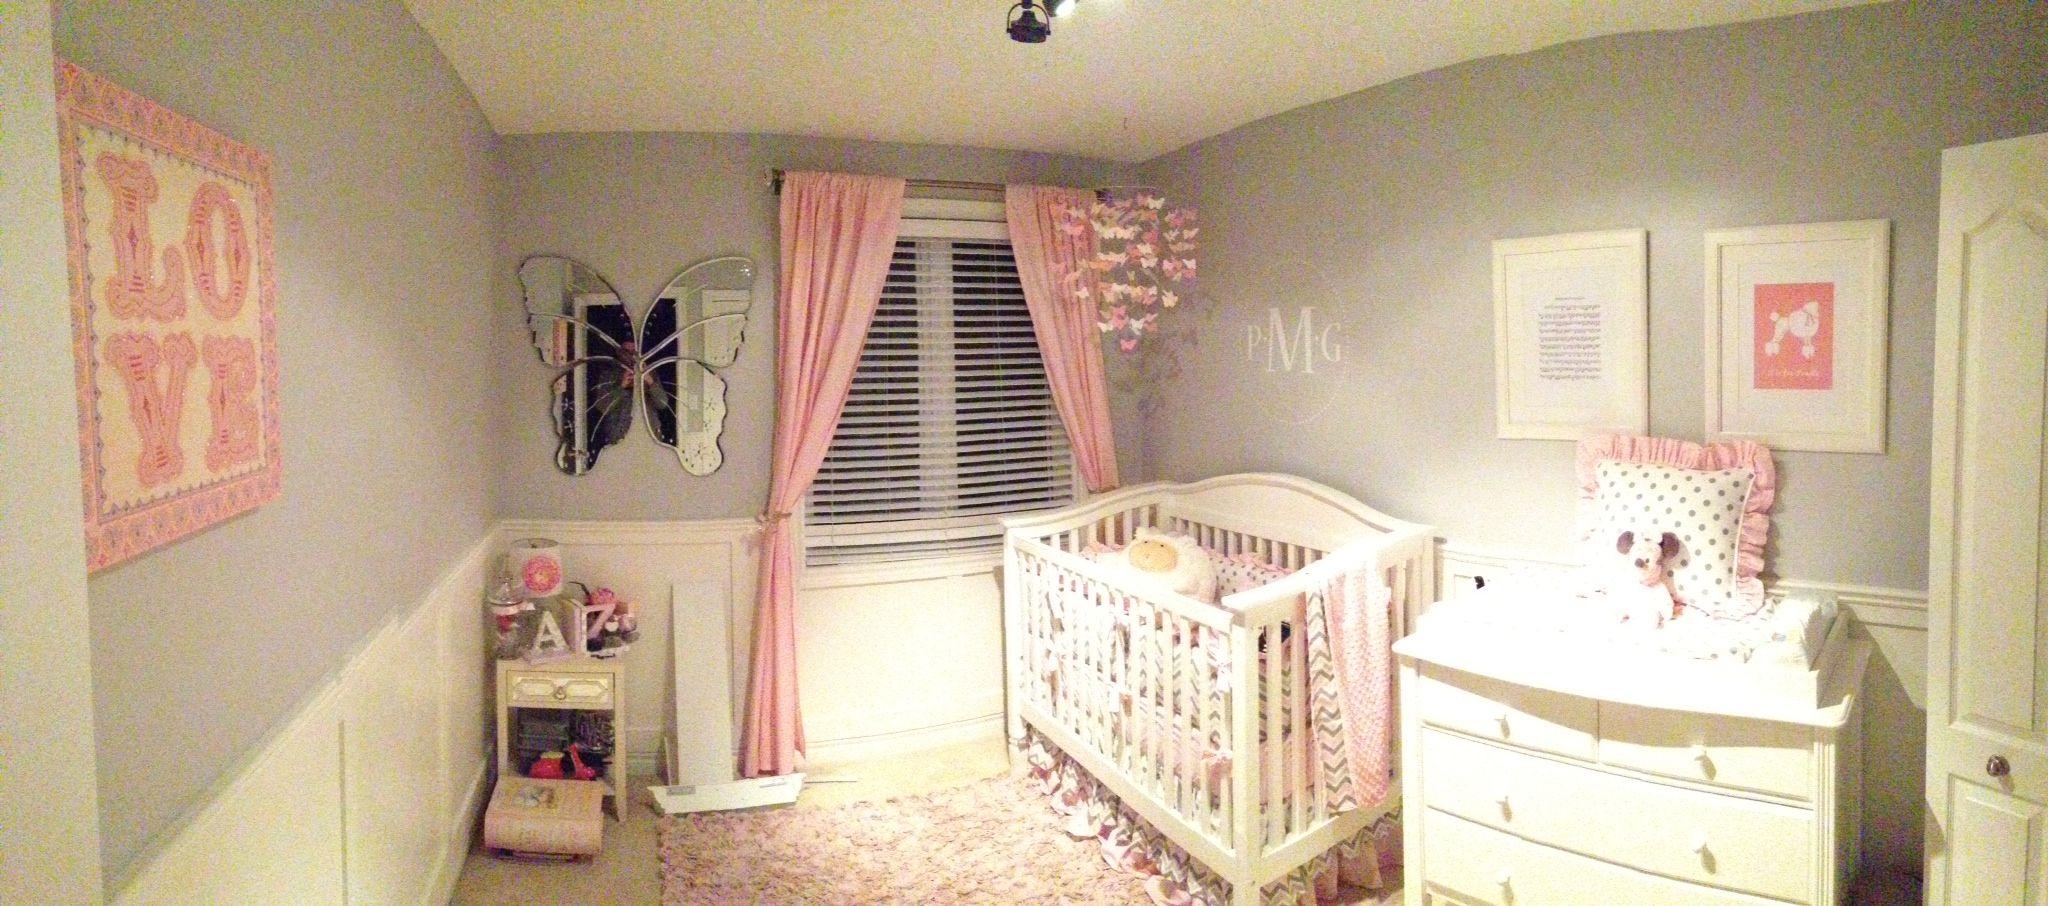 Like the paint color nursery baby nursery e girl nursery - Cameretta neonato idee ...